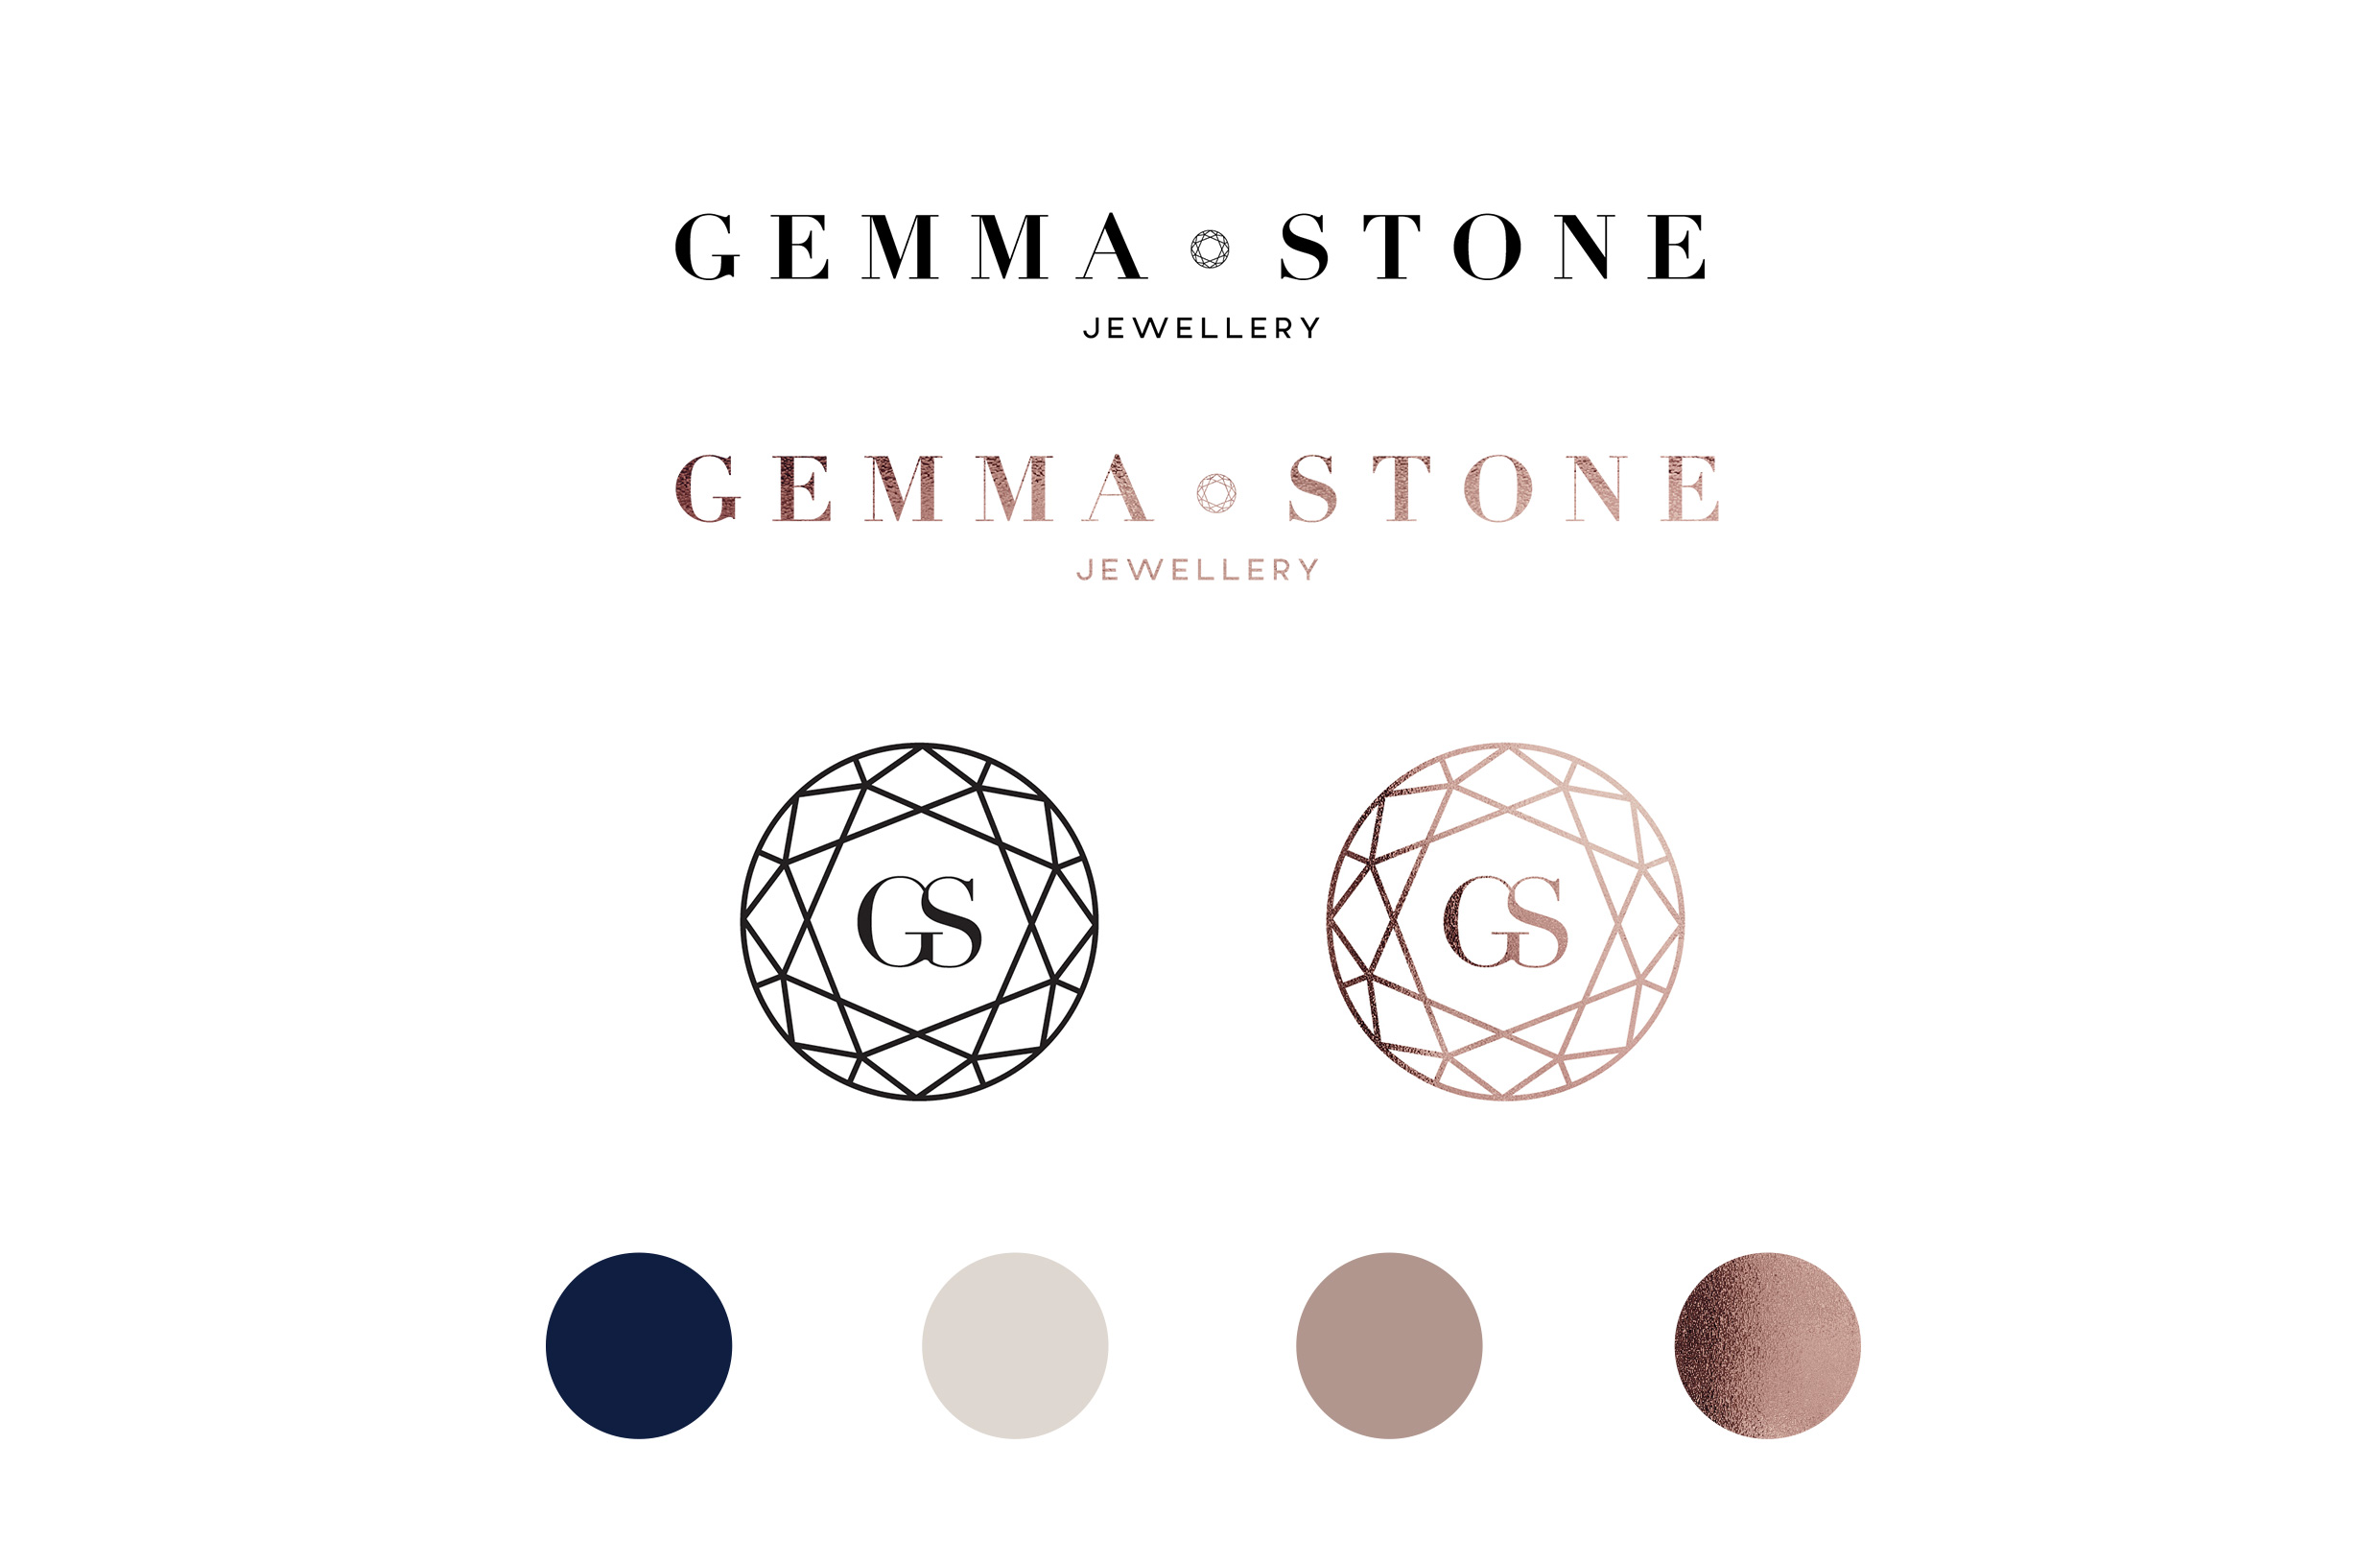 Gemma-stone-branding_01.jpg